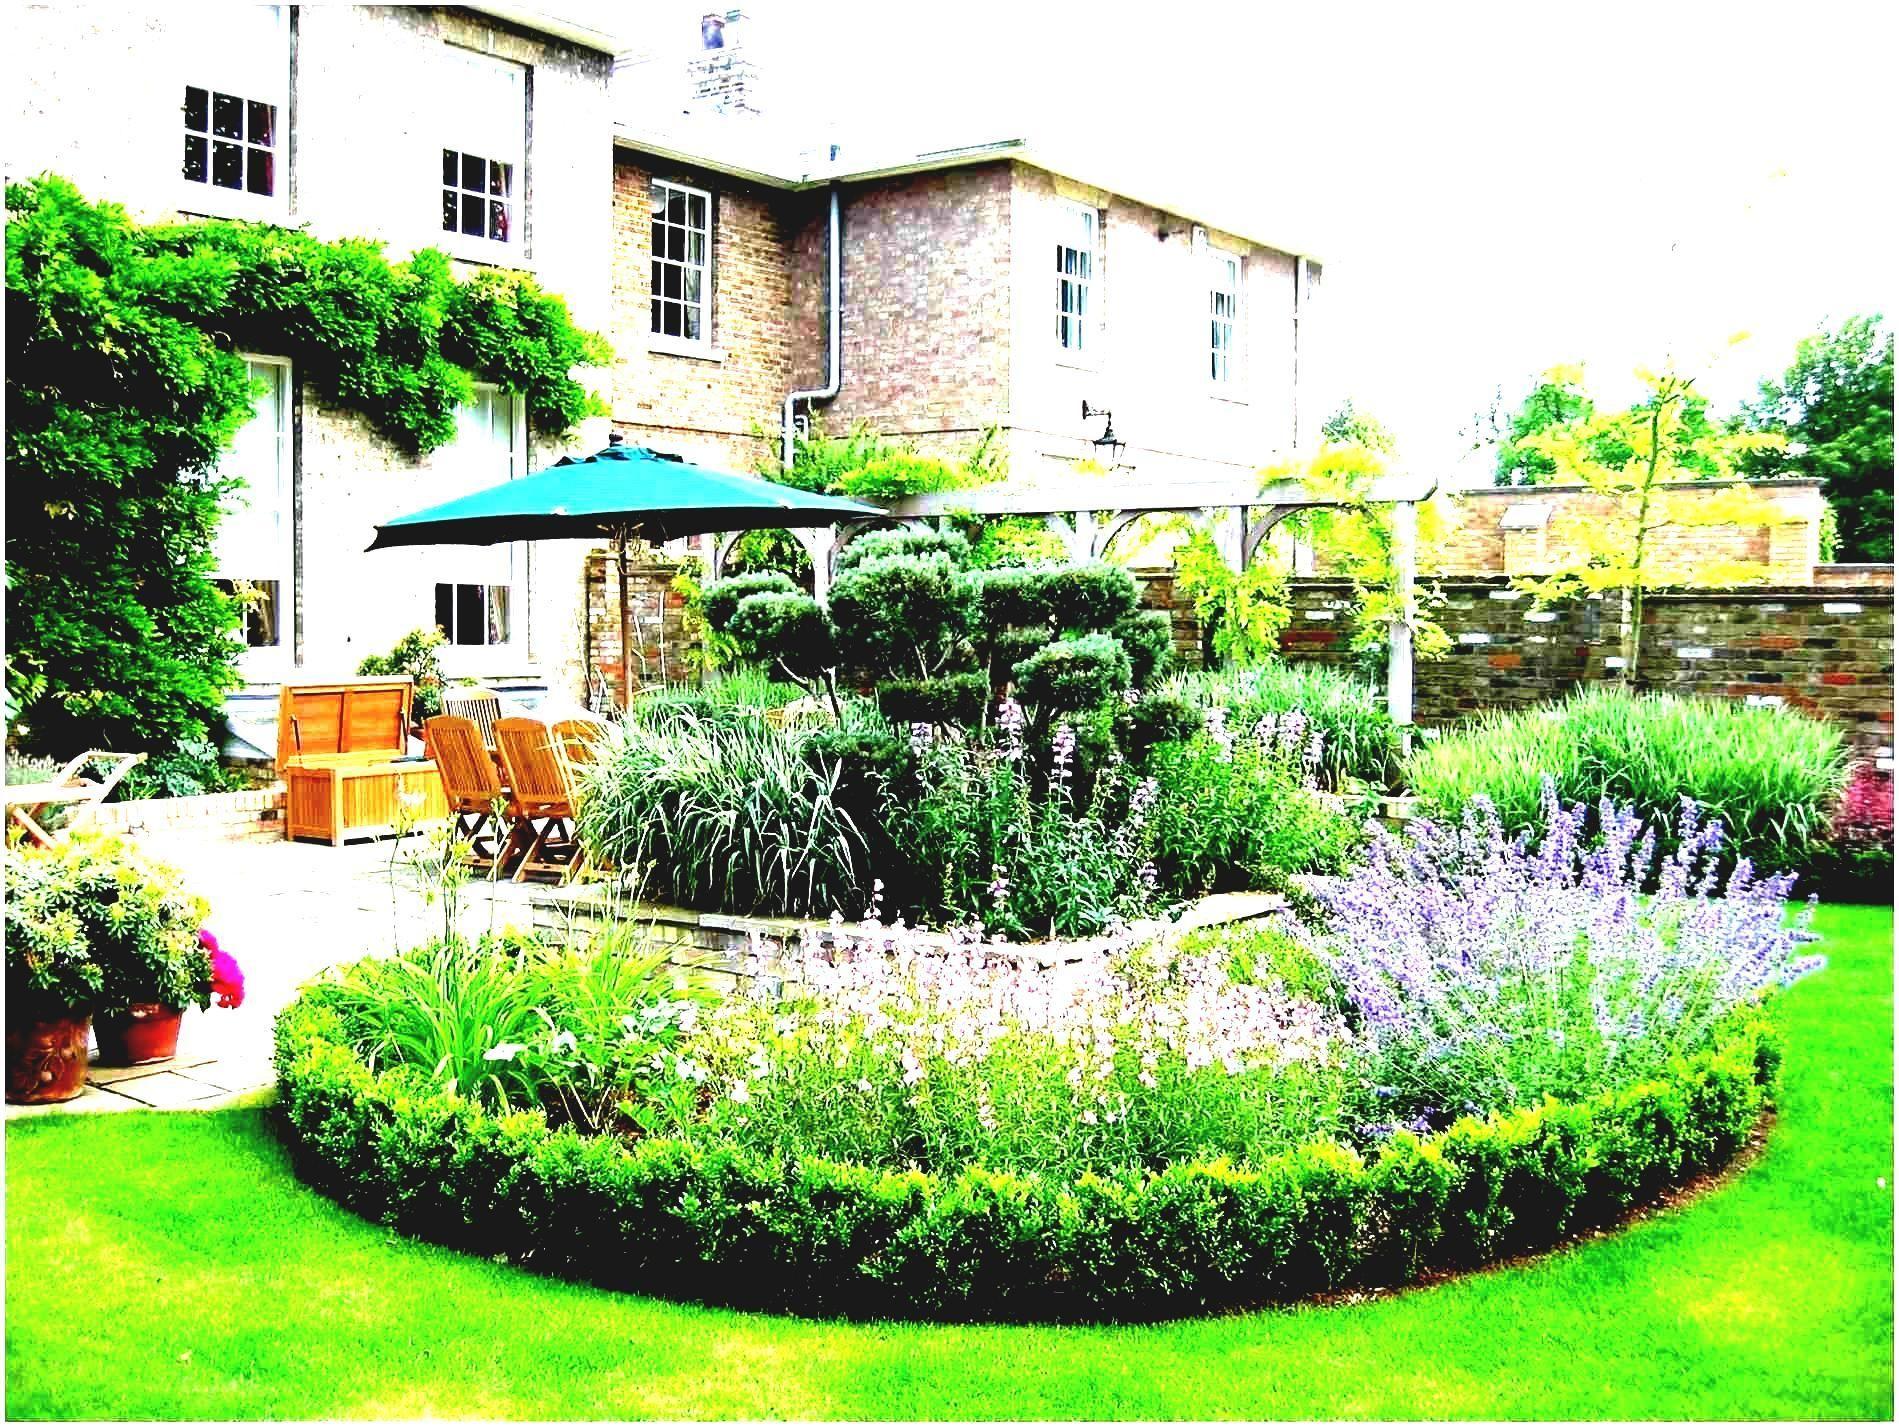 Astonishing Cheap No Grass Backyard Ideas | Low ... on Cheap No Grass Backyard Ideas id=78958